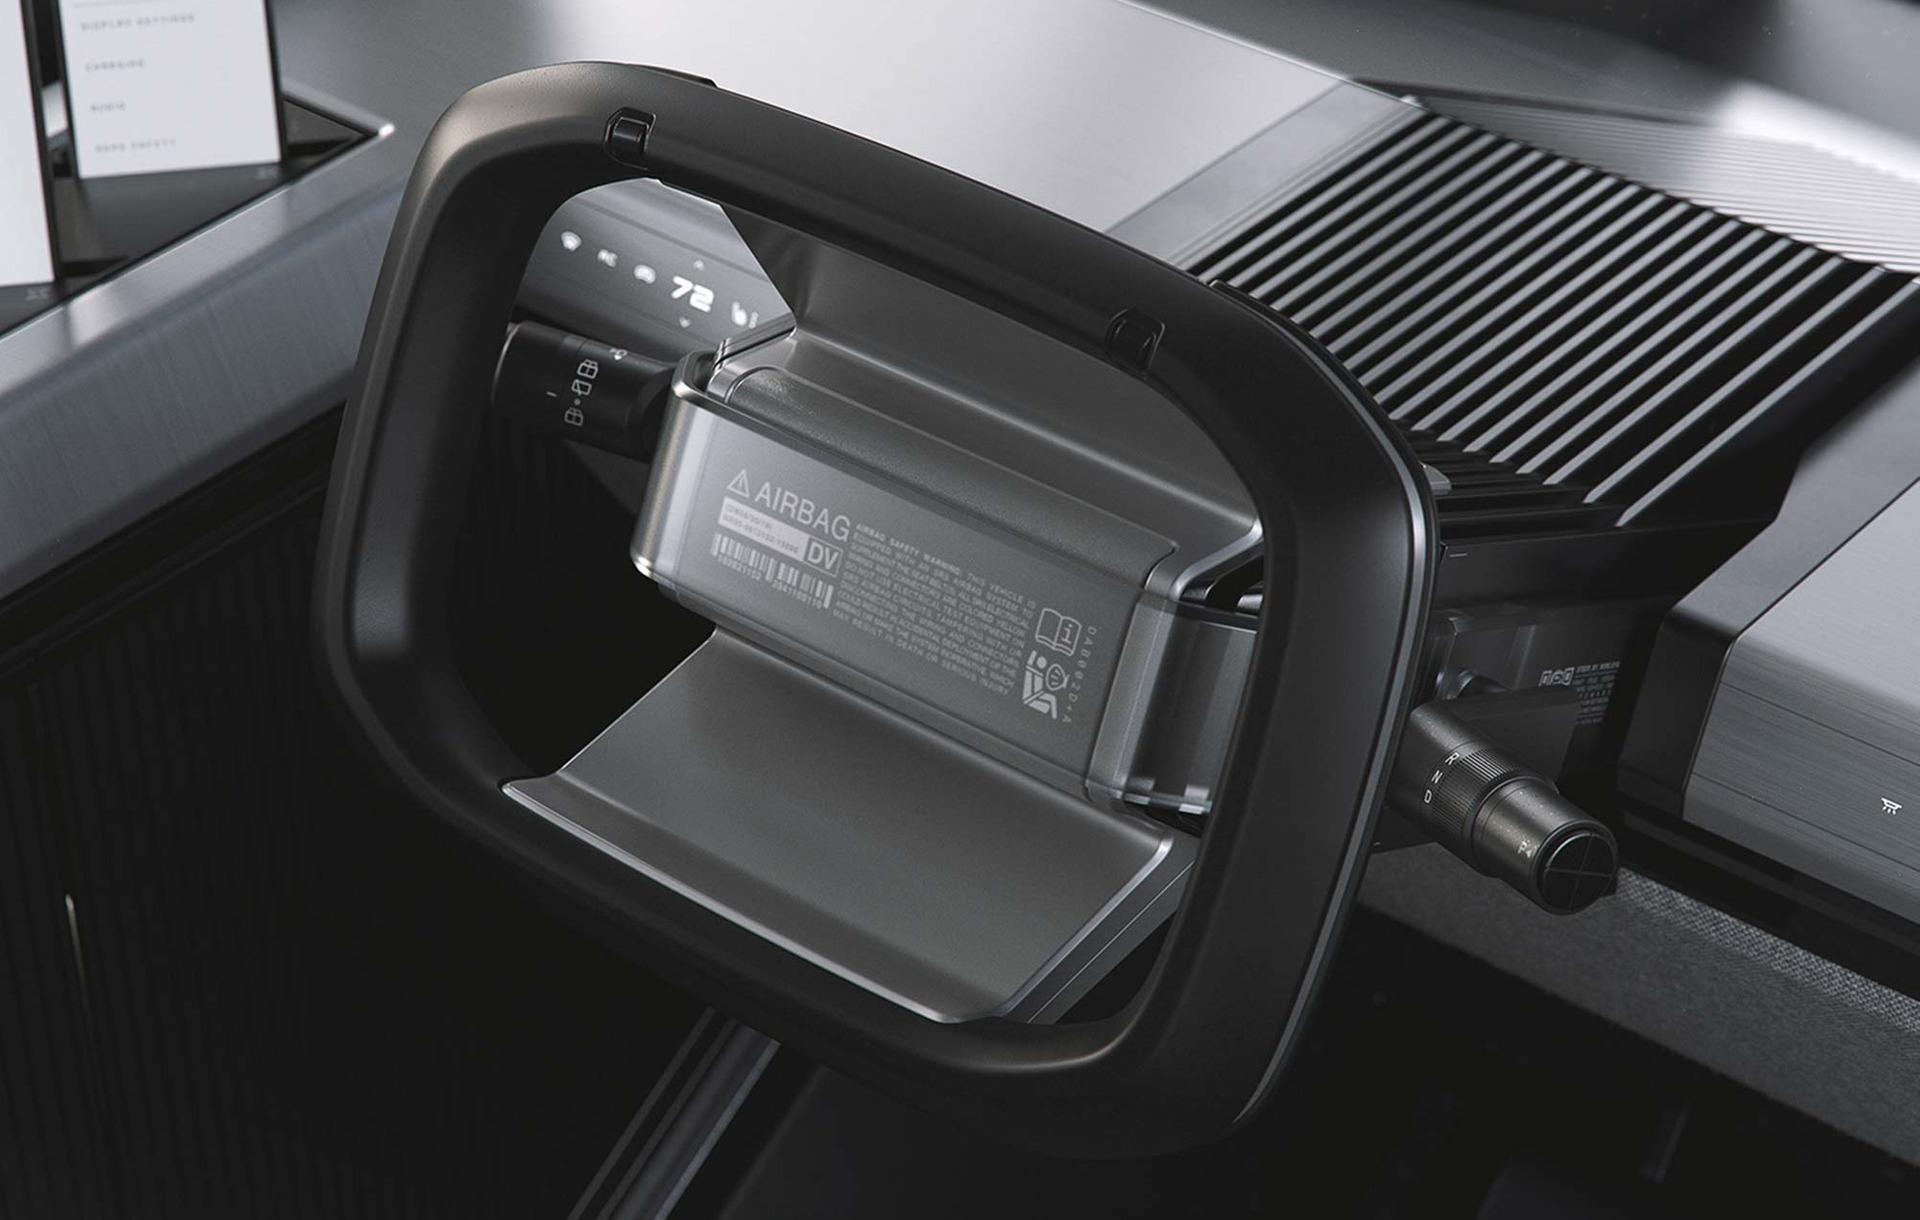 The Canoo multi-purpose delivery vehicle (MPDV) - Driving Wheel